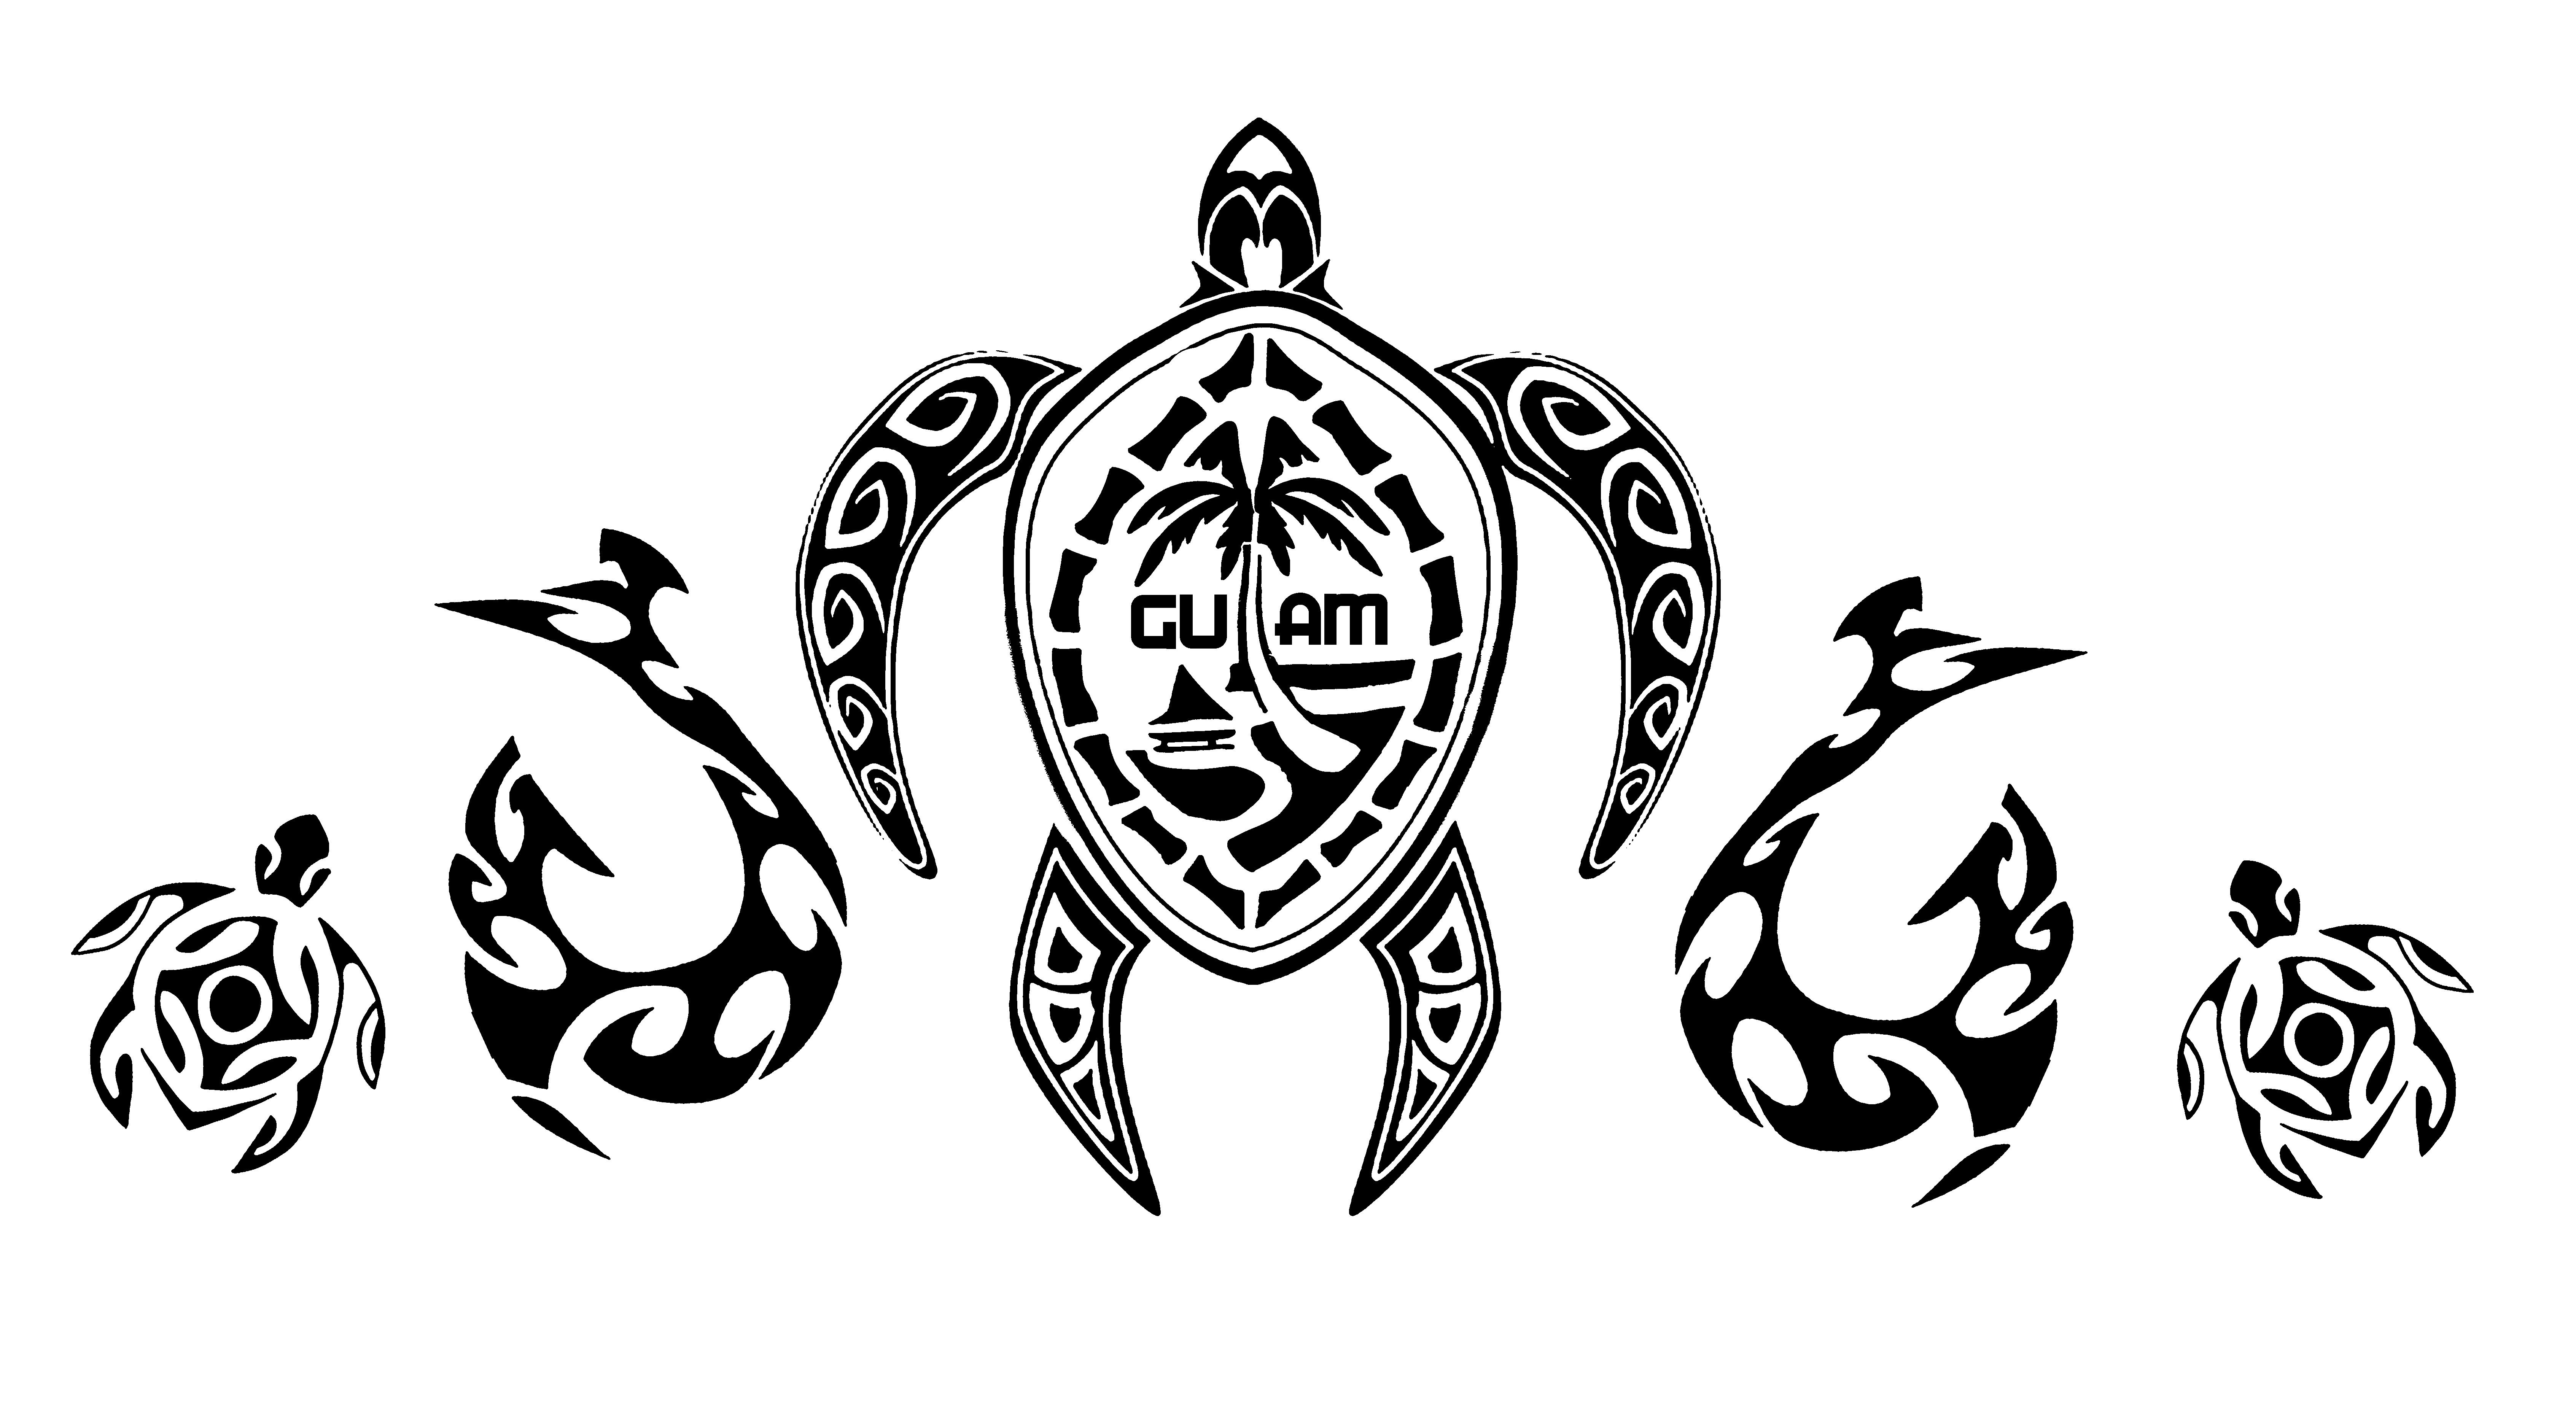 male style guam window decal graphicsbydre Guam Font windowdecal